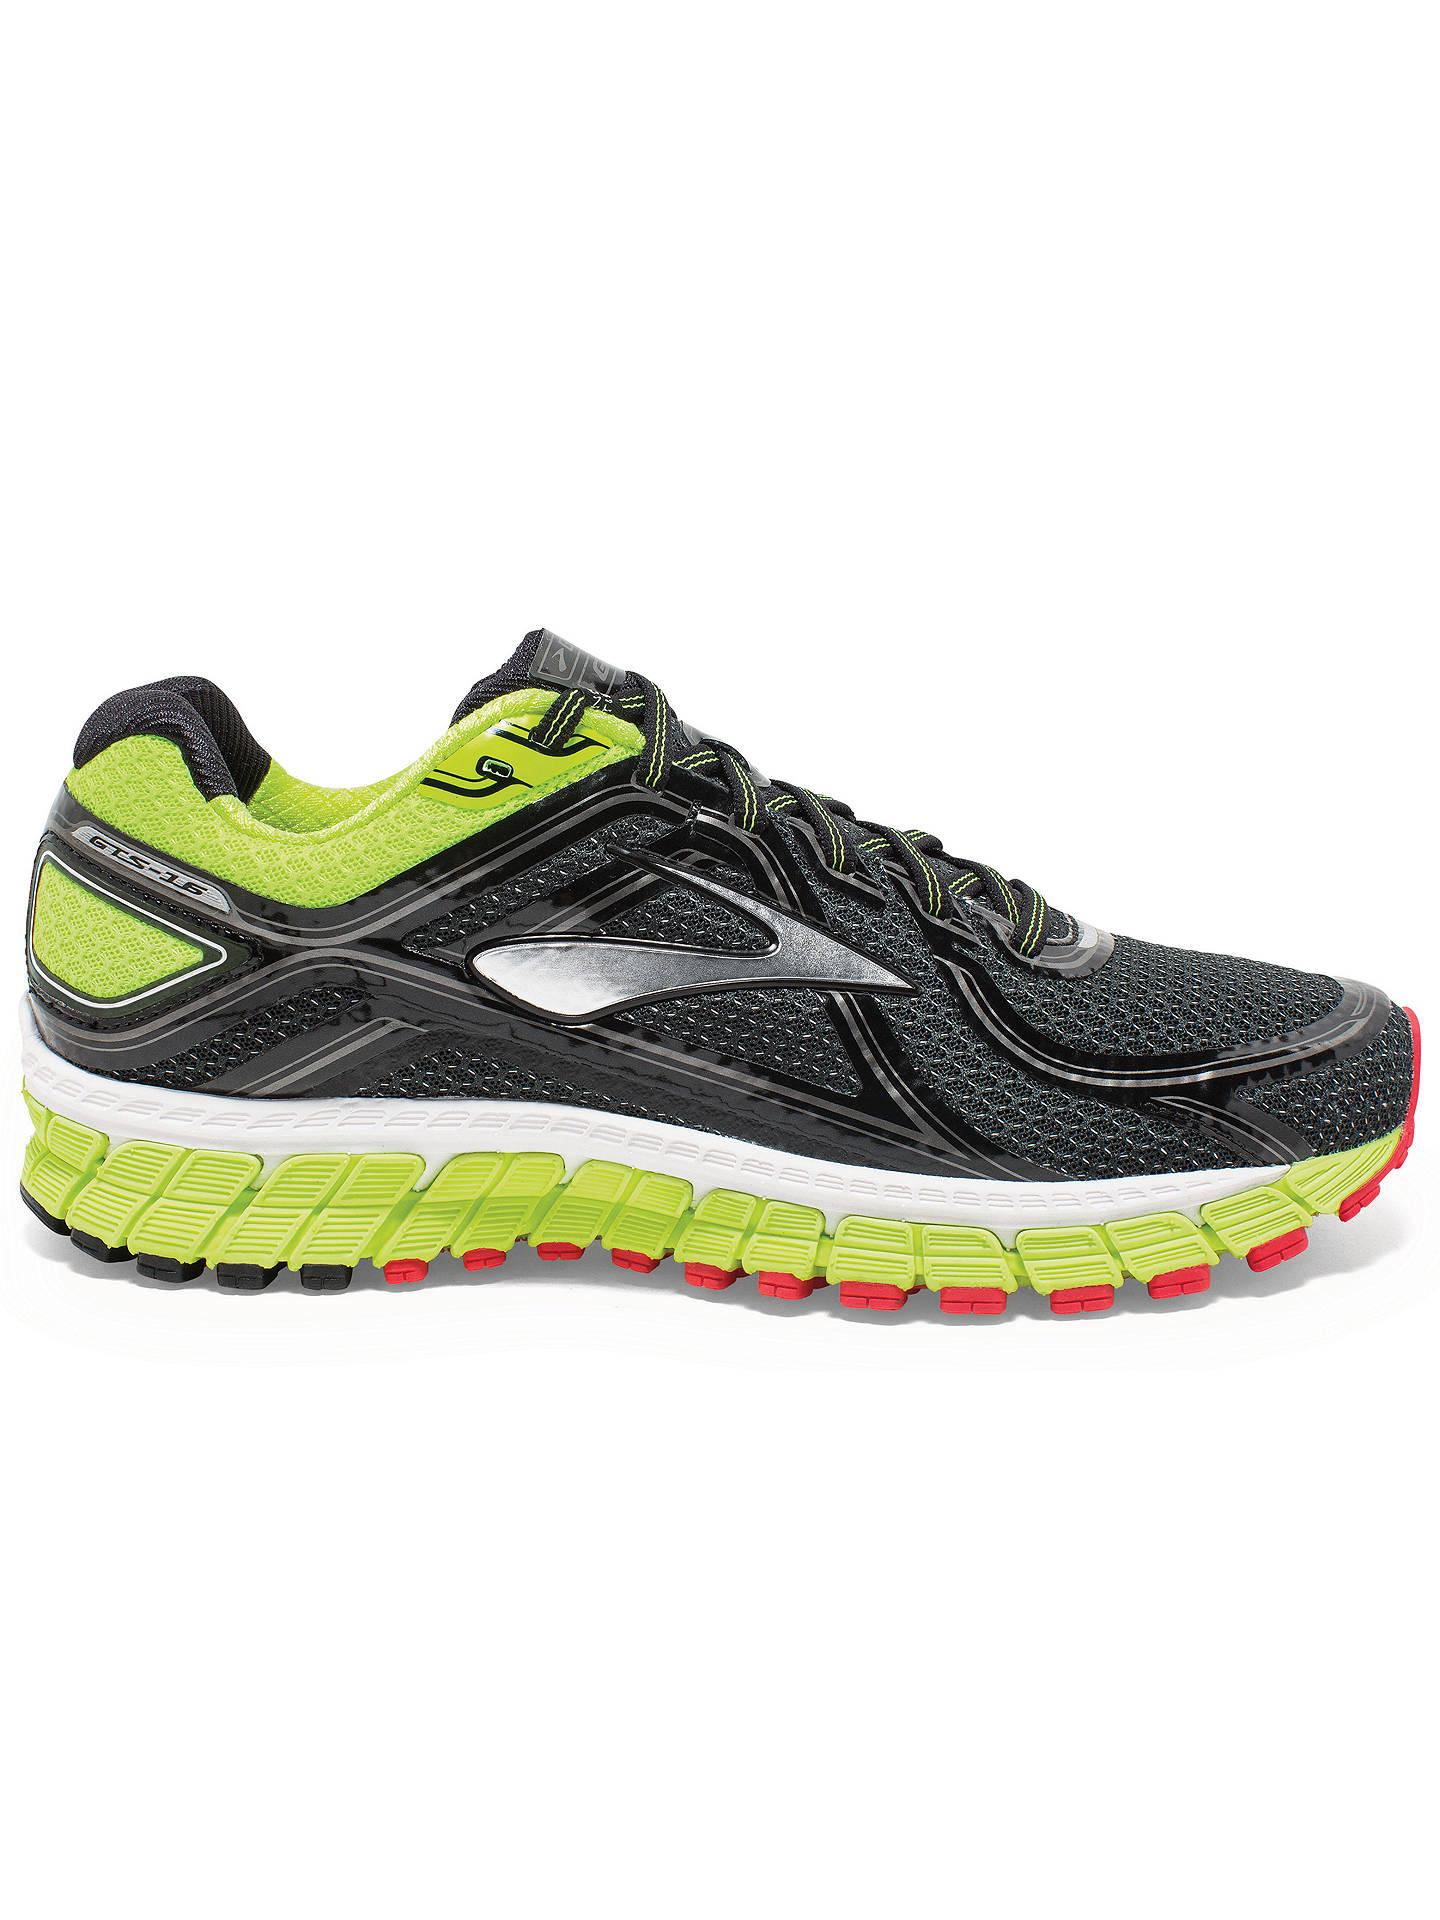 77e864bc944a1 Buy Brooks Adrenaline GTS 16 Men s Running Shoes